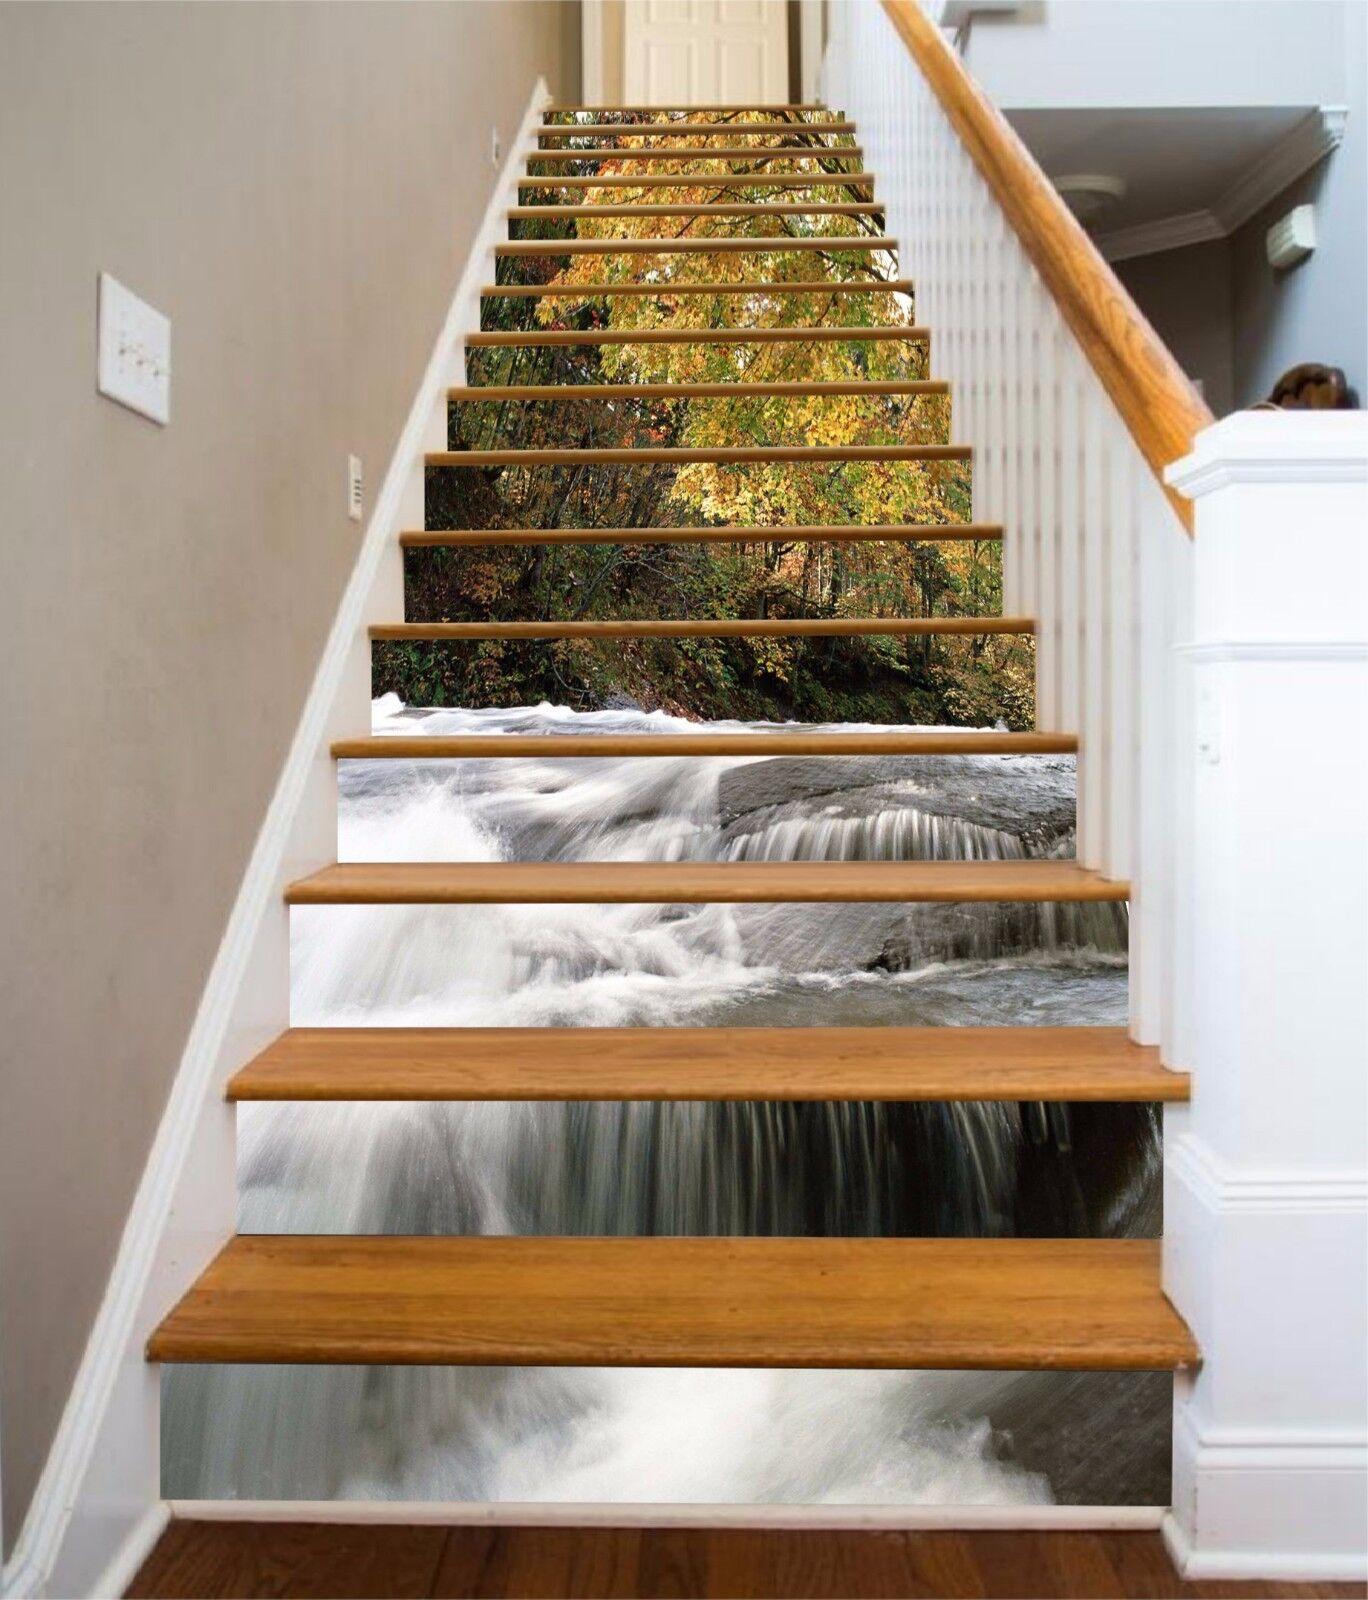 3D Forest River 533 Stair Risers Decoration Photo Mural Vinyl Decal WandPapier UK